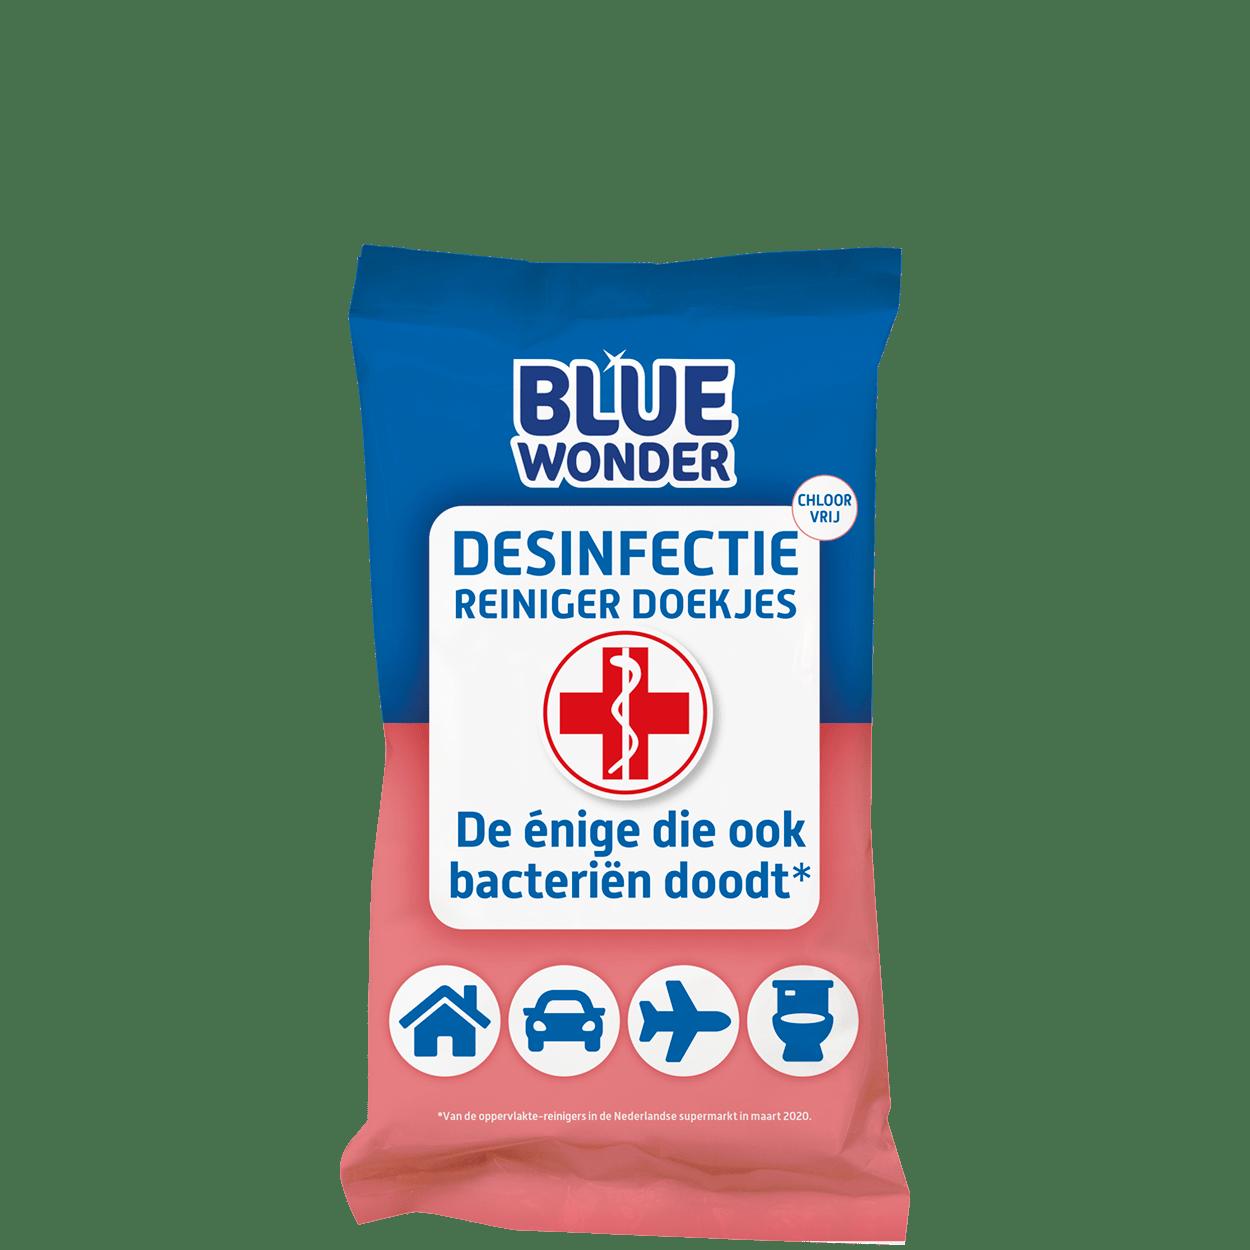 8712038001608 Blue Wonder Desinfectie Reiniger doekjes 20 front